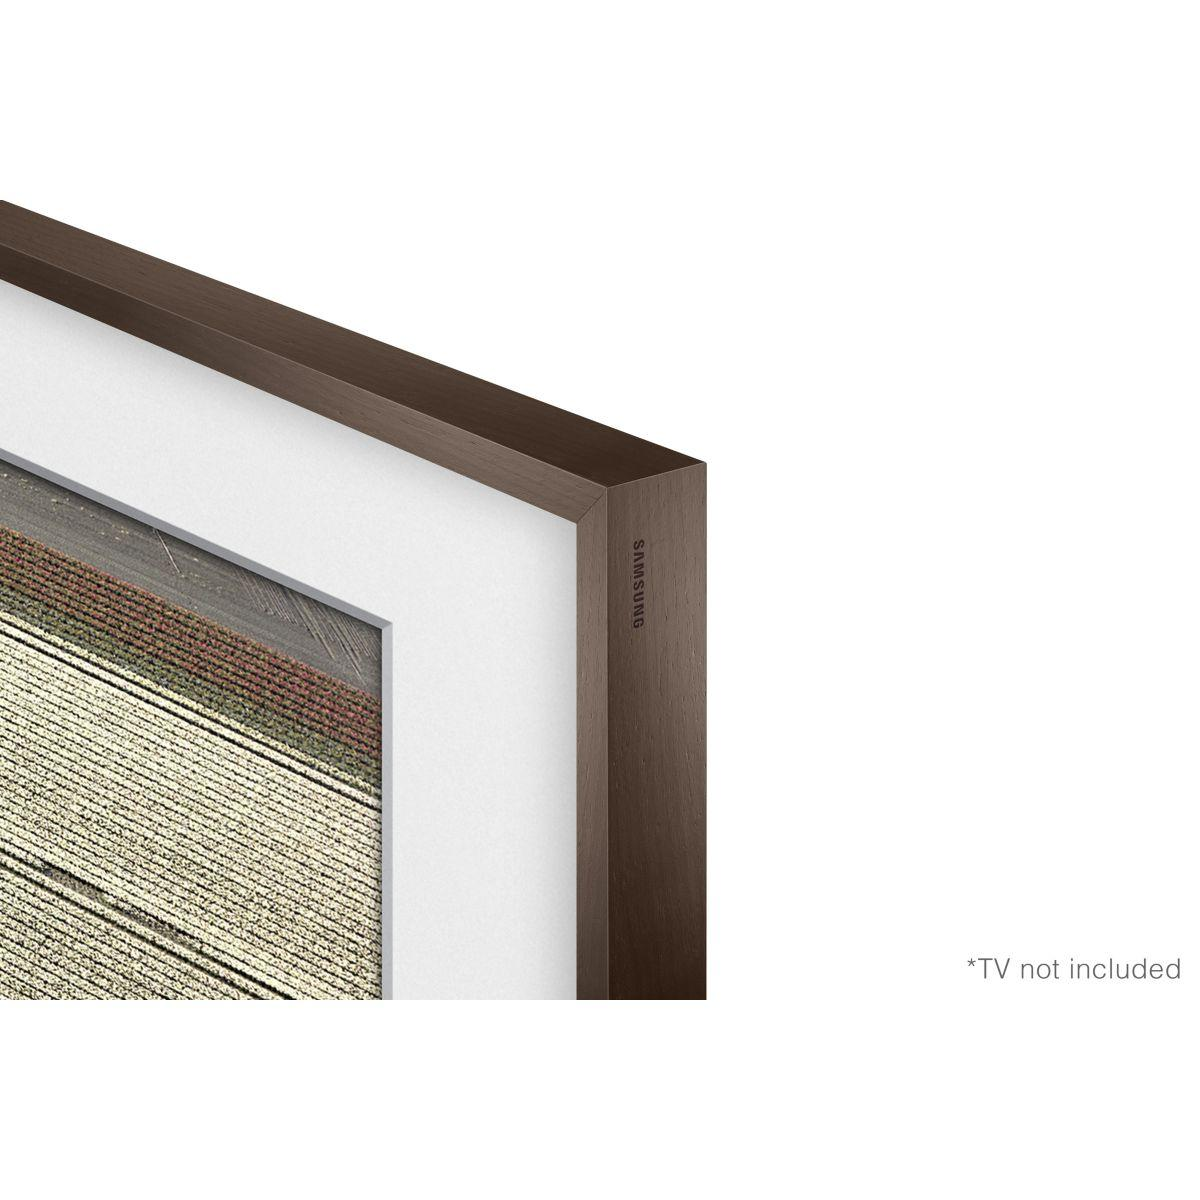 Cadre the frame samsung cadre vg-scfm55dw the frame dark wood - 10% de remise imm�diate avec le code : fete10 (photo)